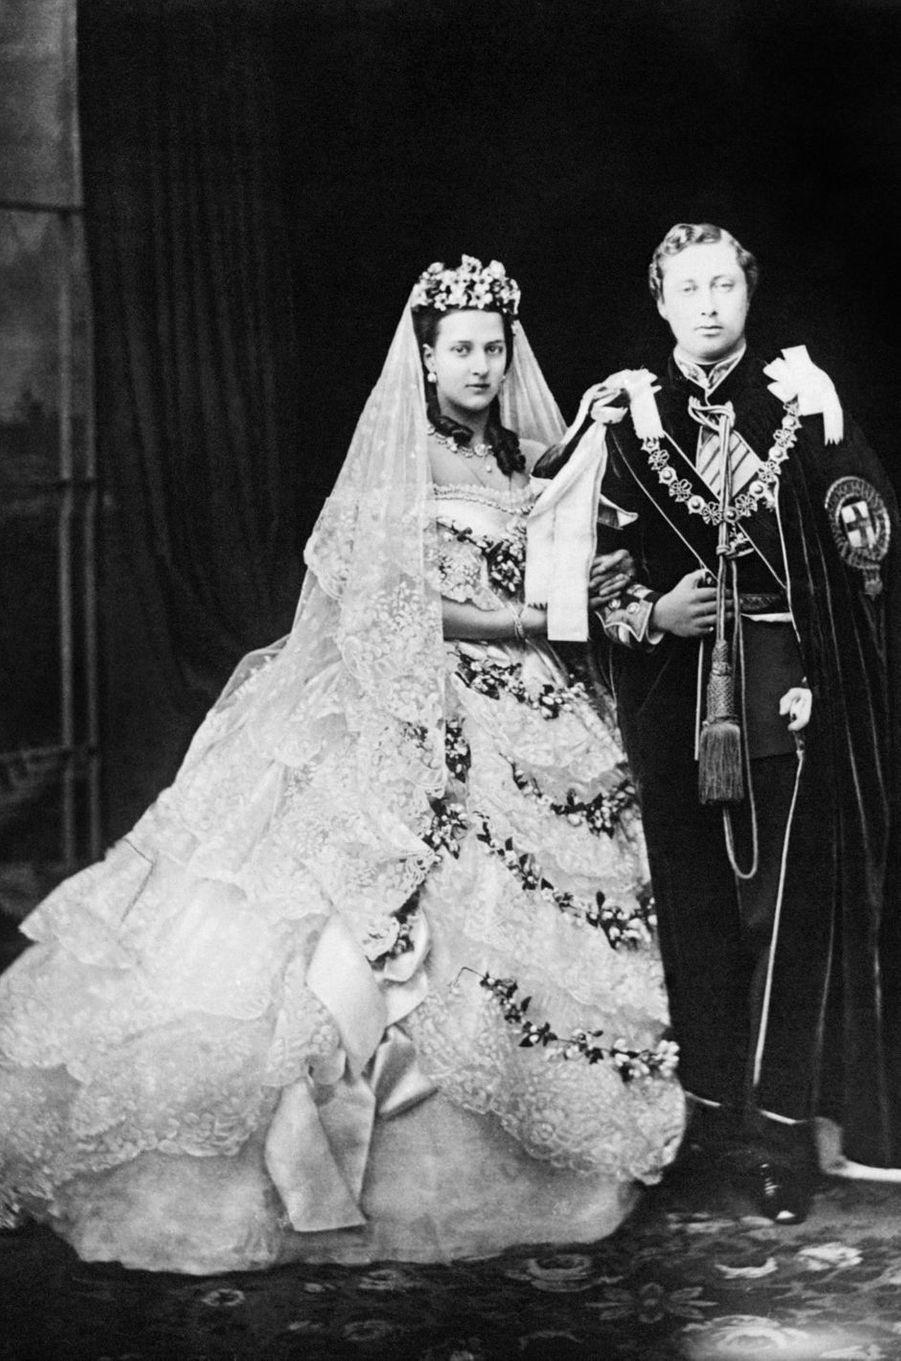 Le prince Albert (fils de la reine Victoria, futur roi Edward VII) et la princesse Alexandra de Danemark, le 10 mars 1863